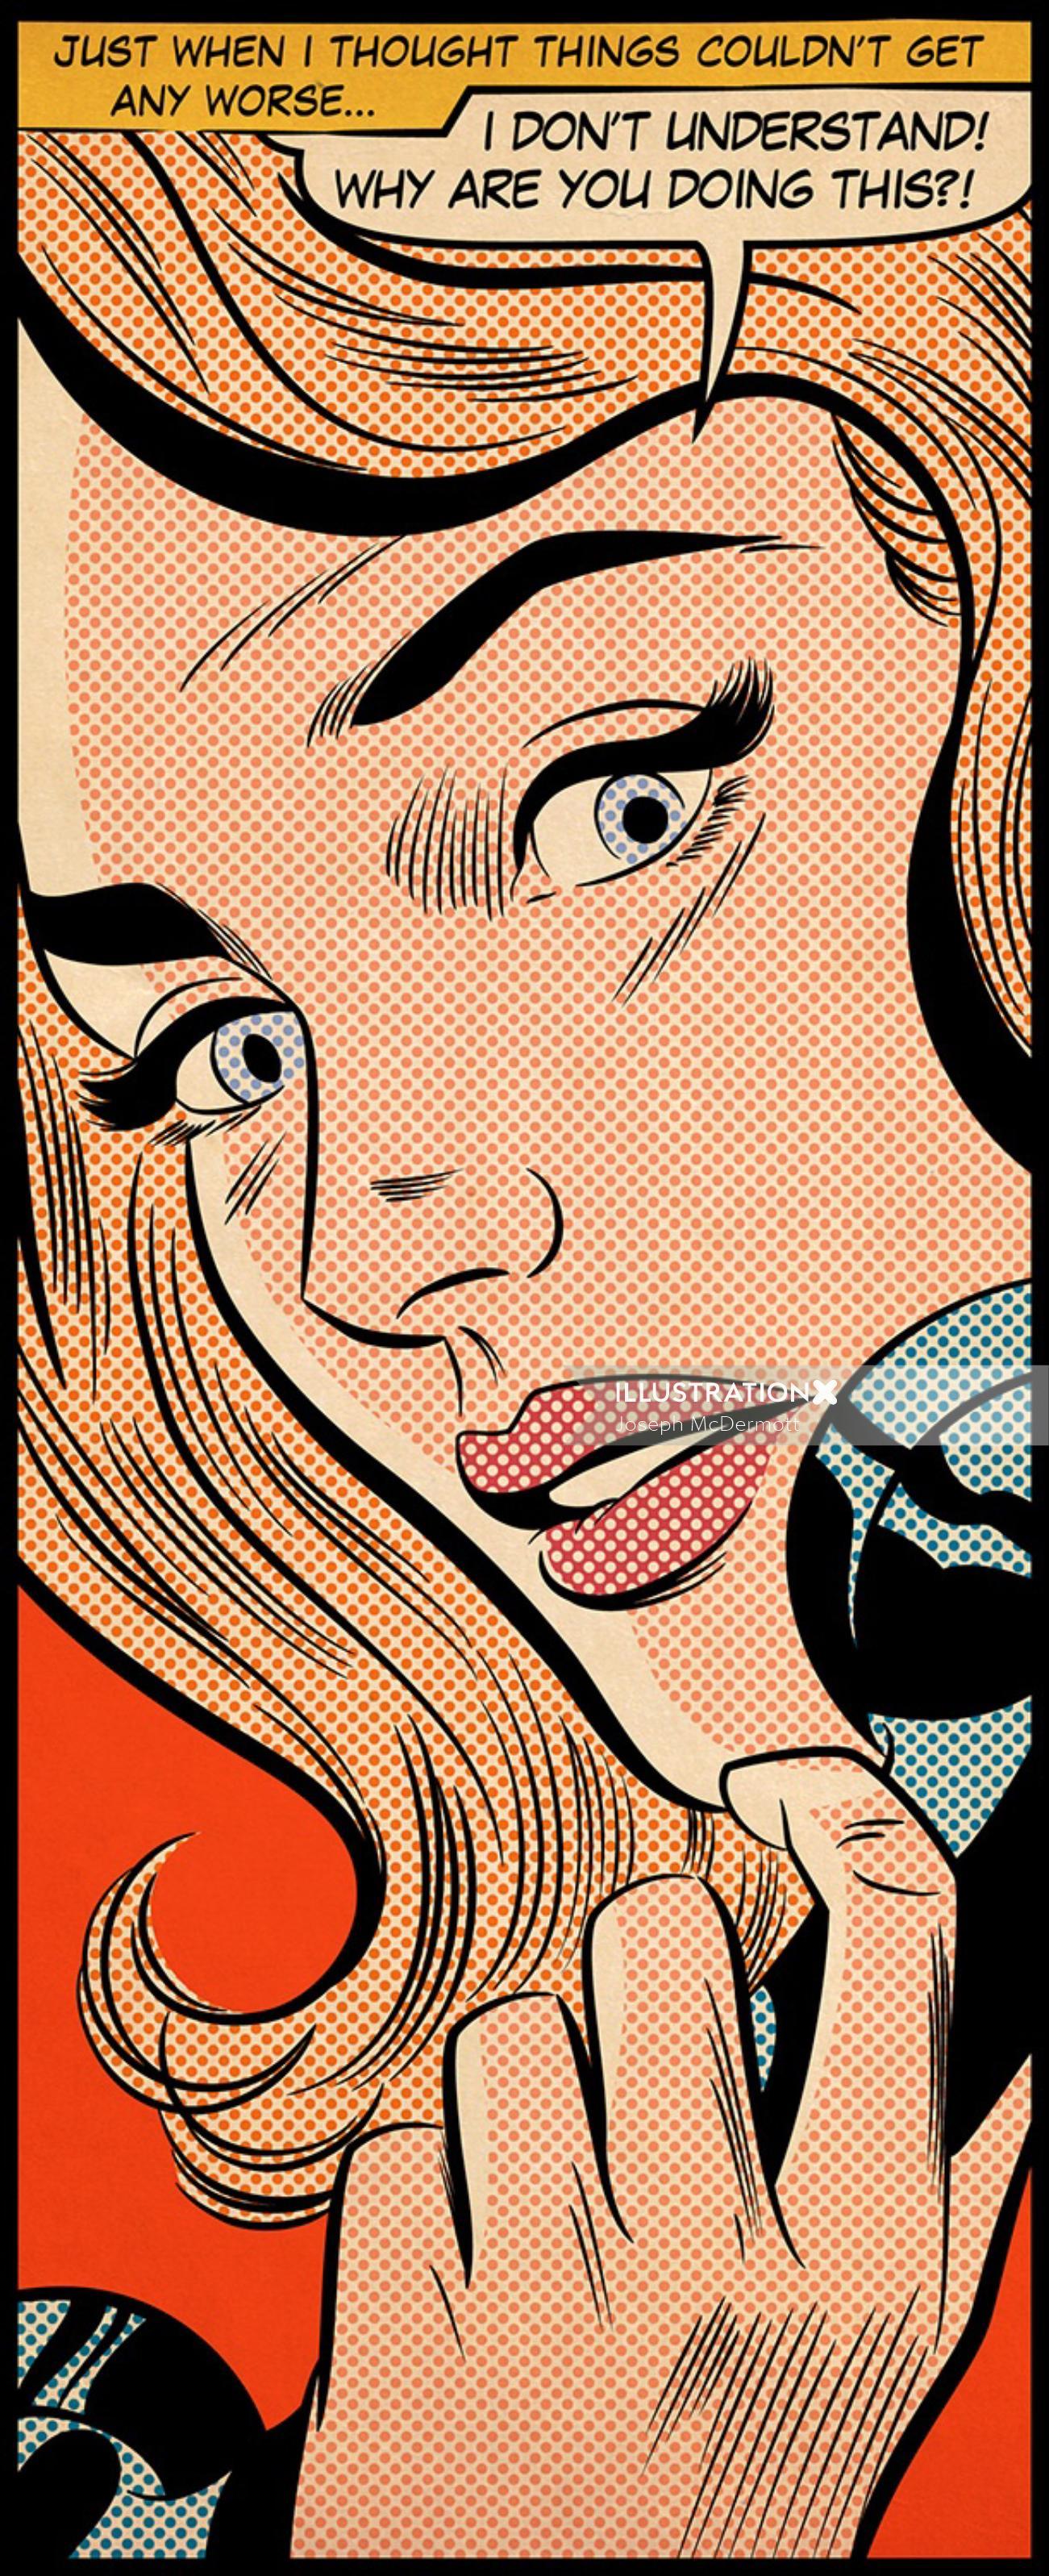 Comic art of woman on phone